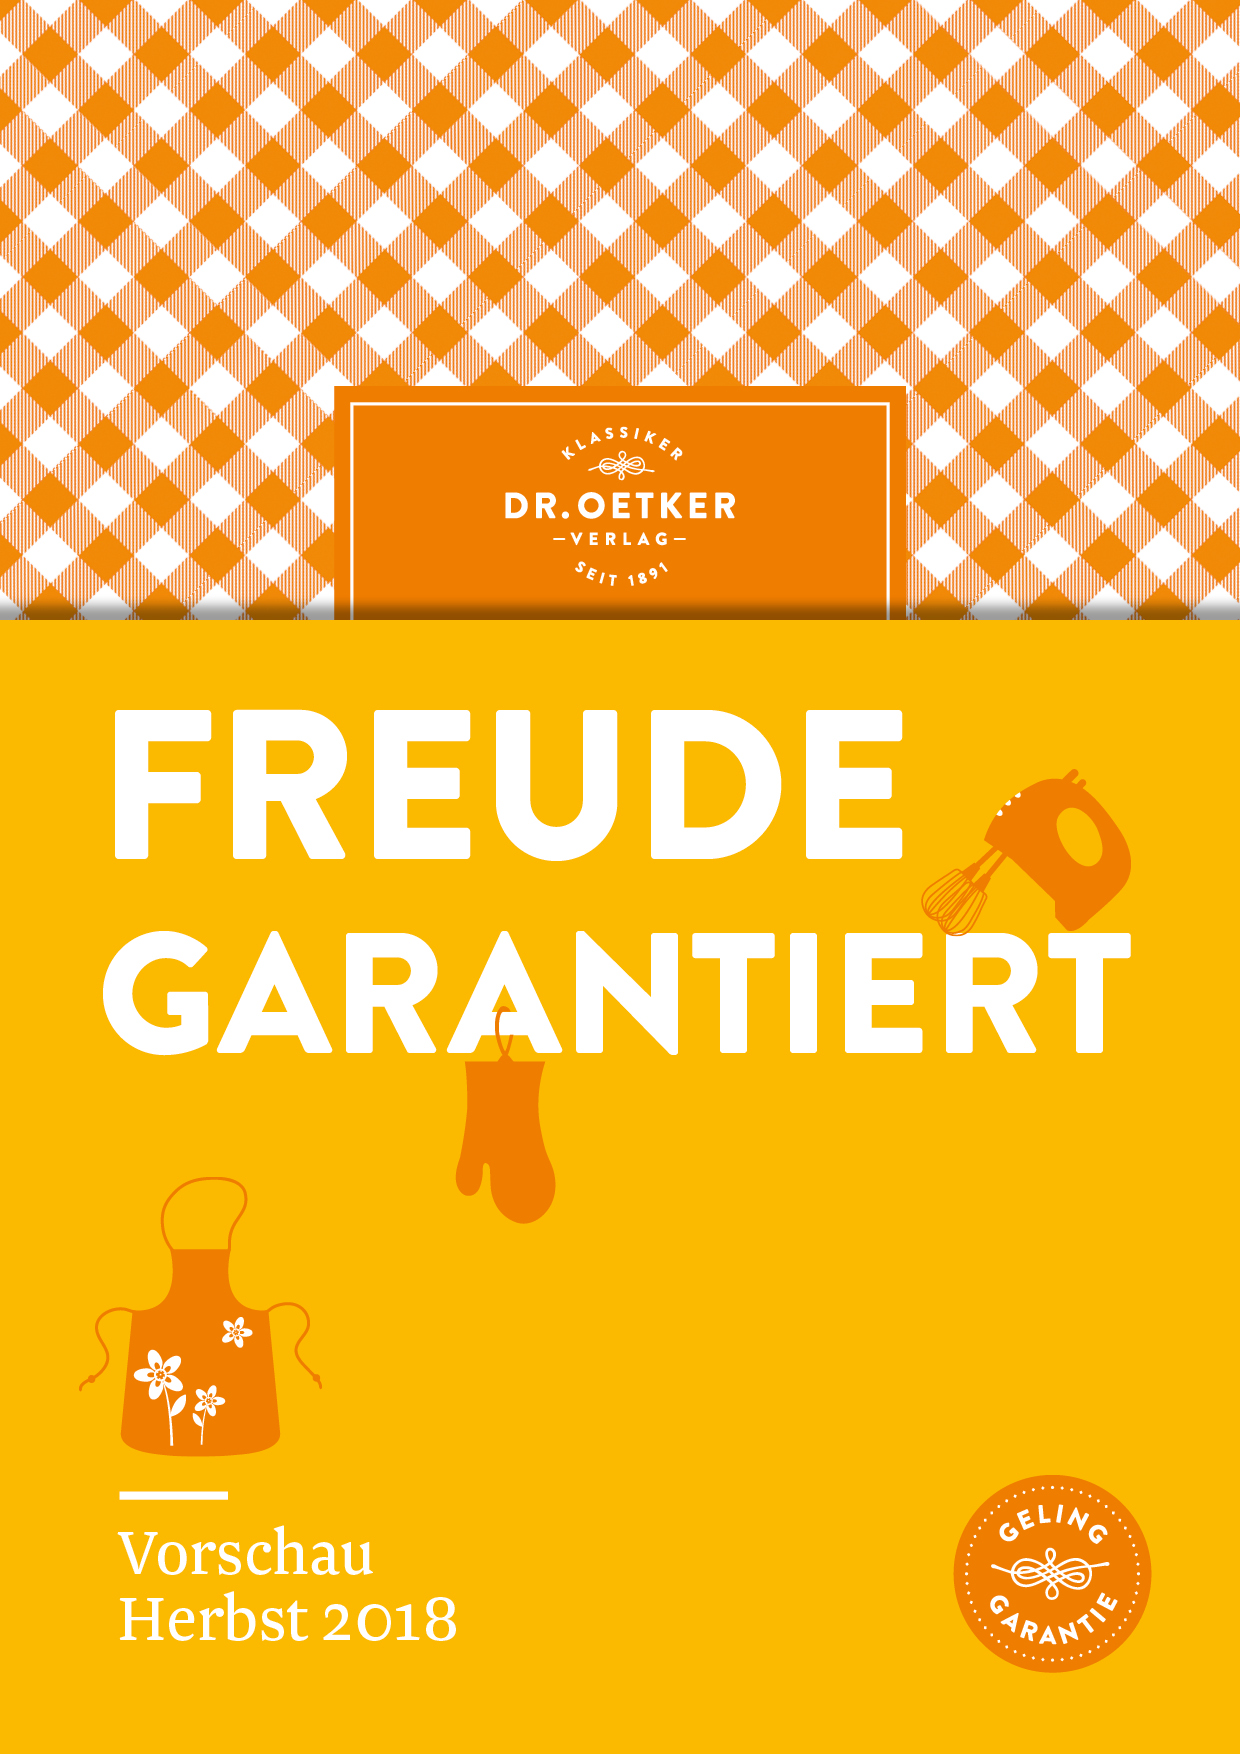 Dr. Oetker Verlag Herbst 2018